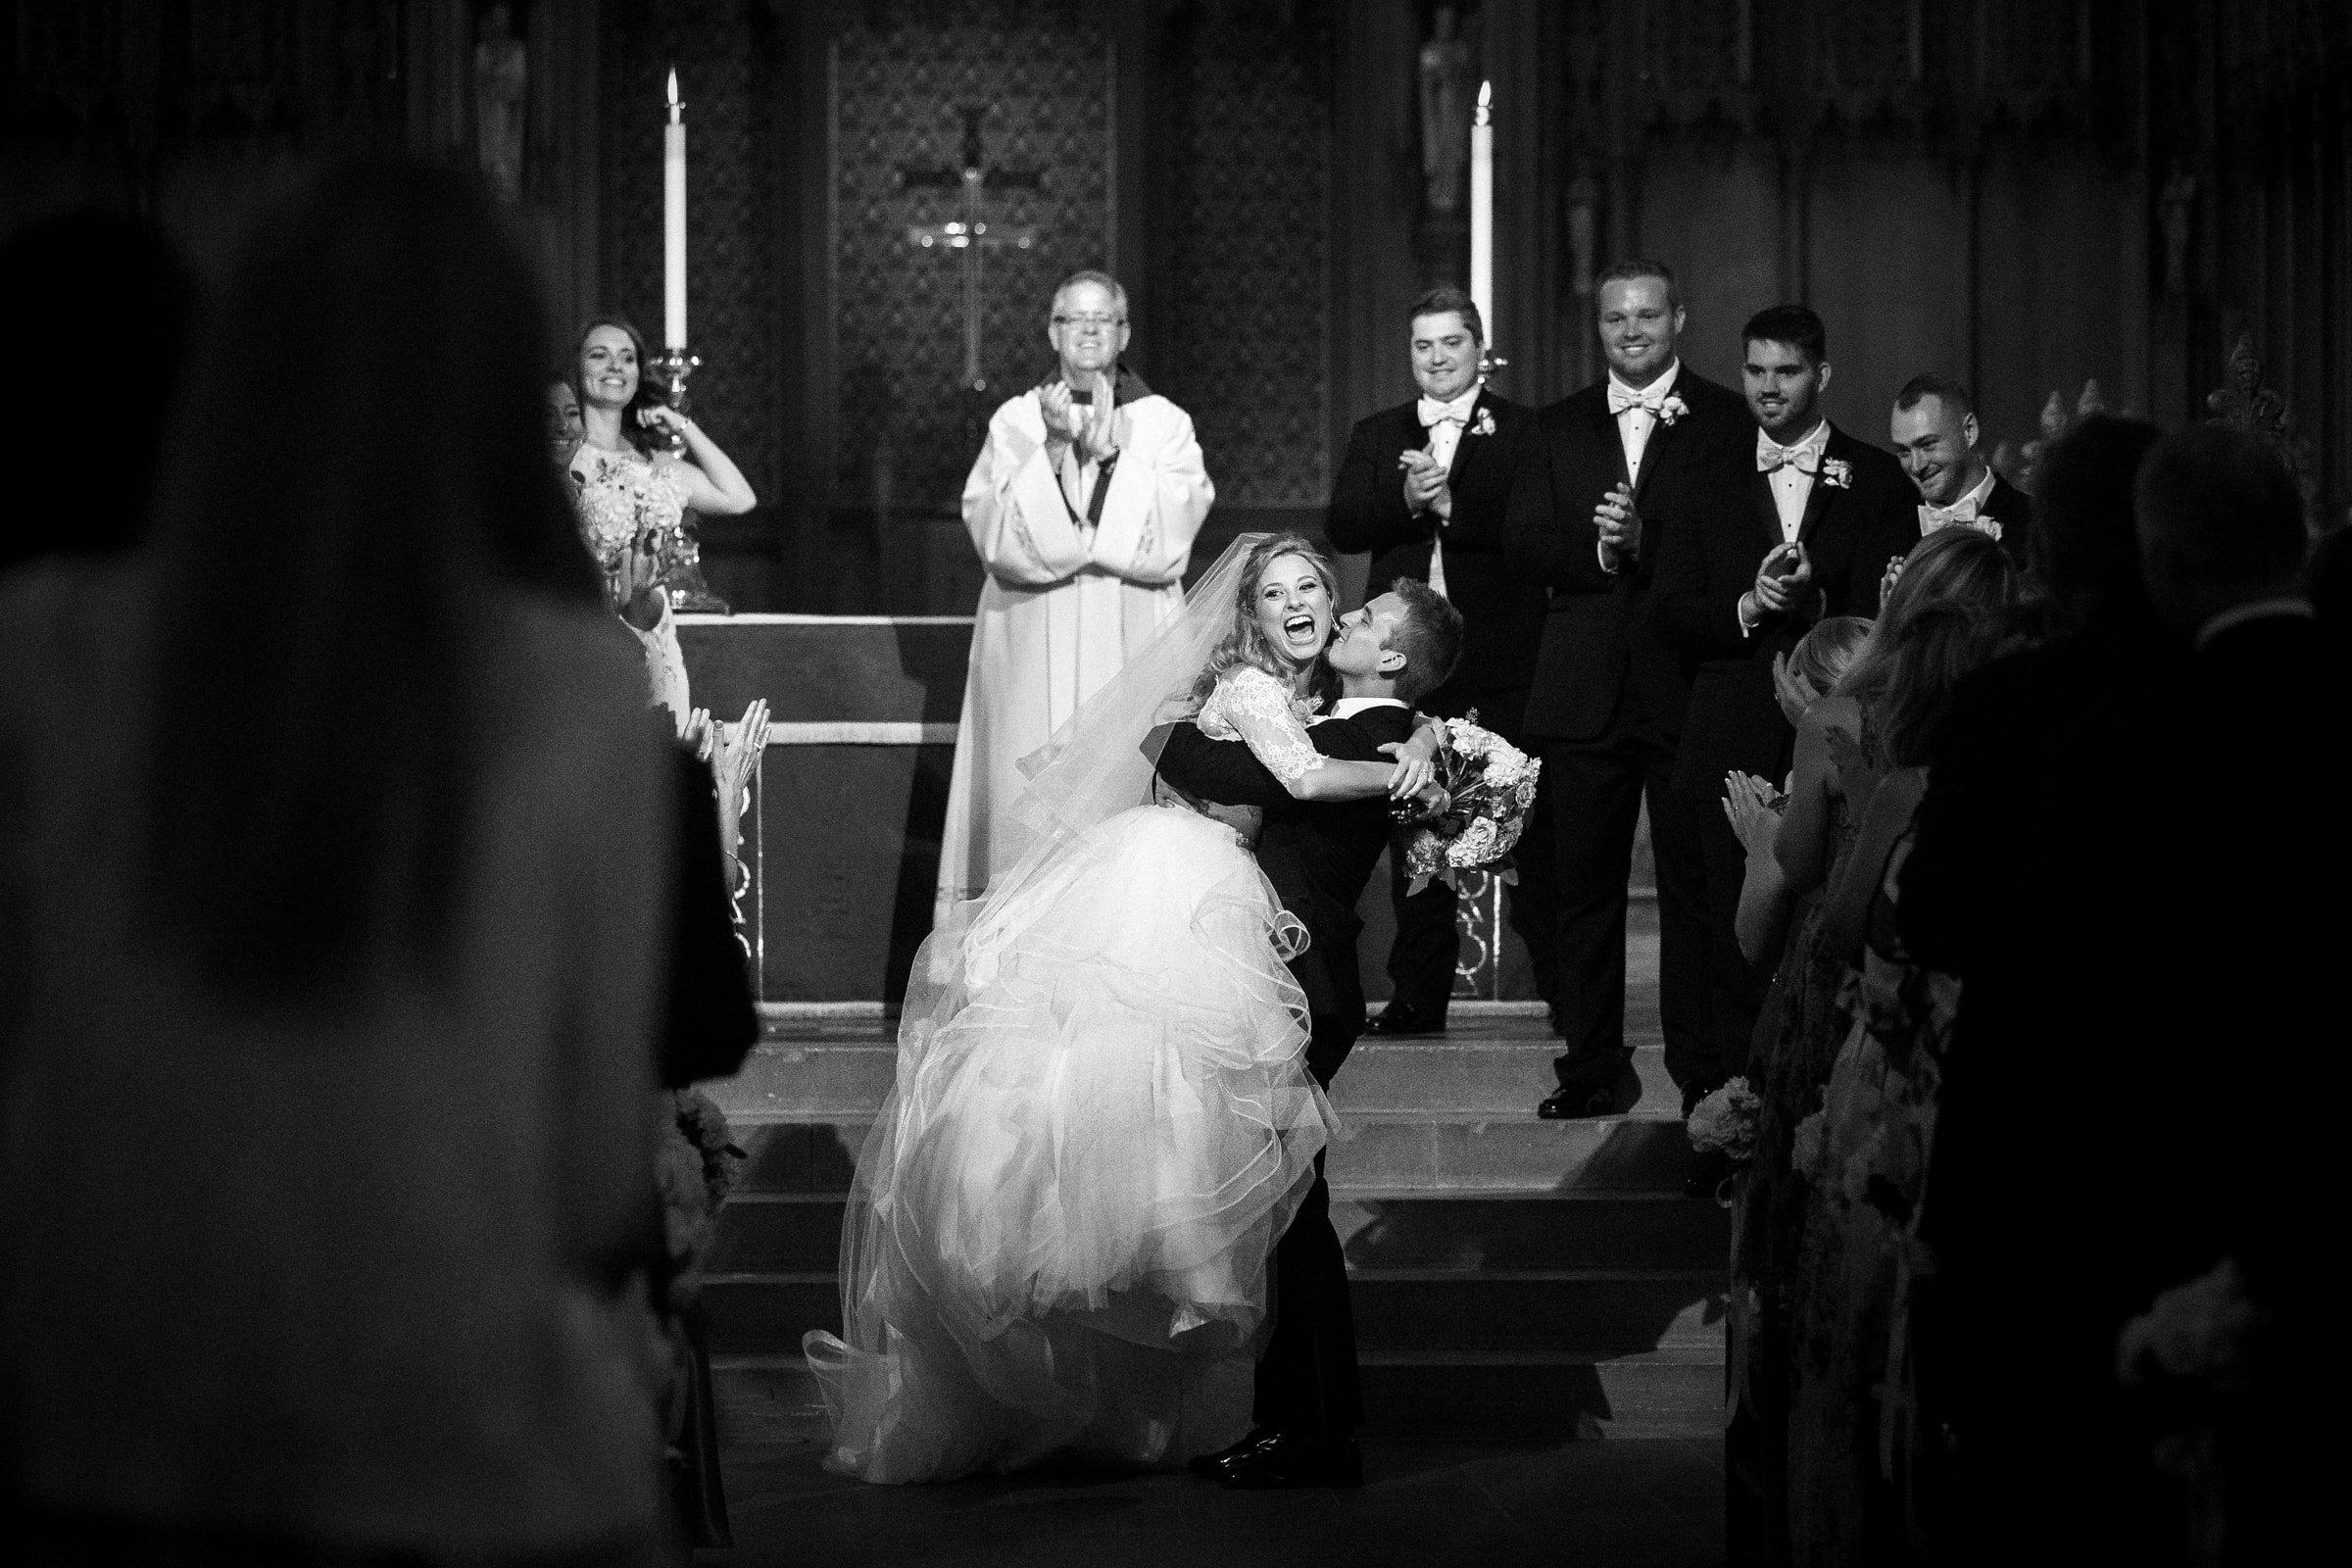 Duke Chapel Wedding Photo of Newlywed Bride & Groom Celebrating by Joe Payne Photography